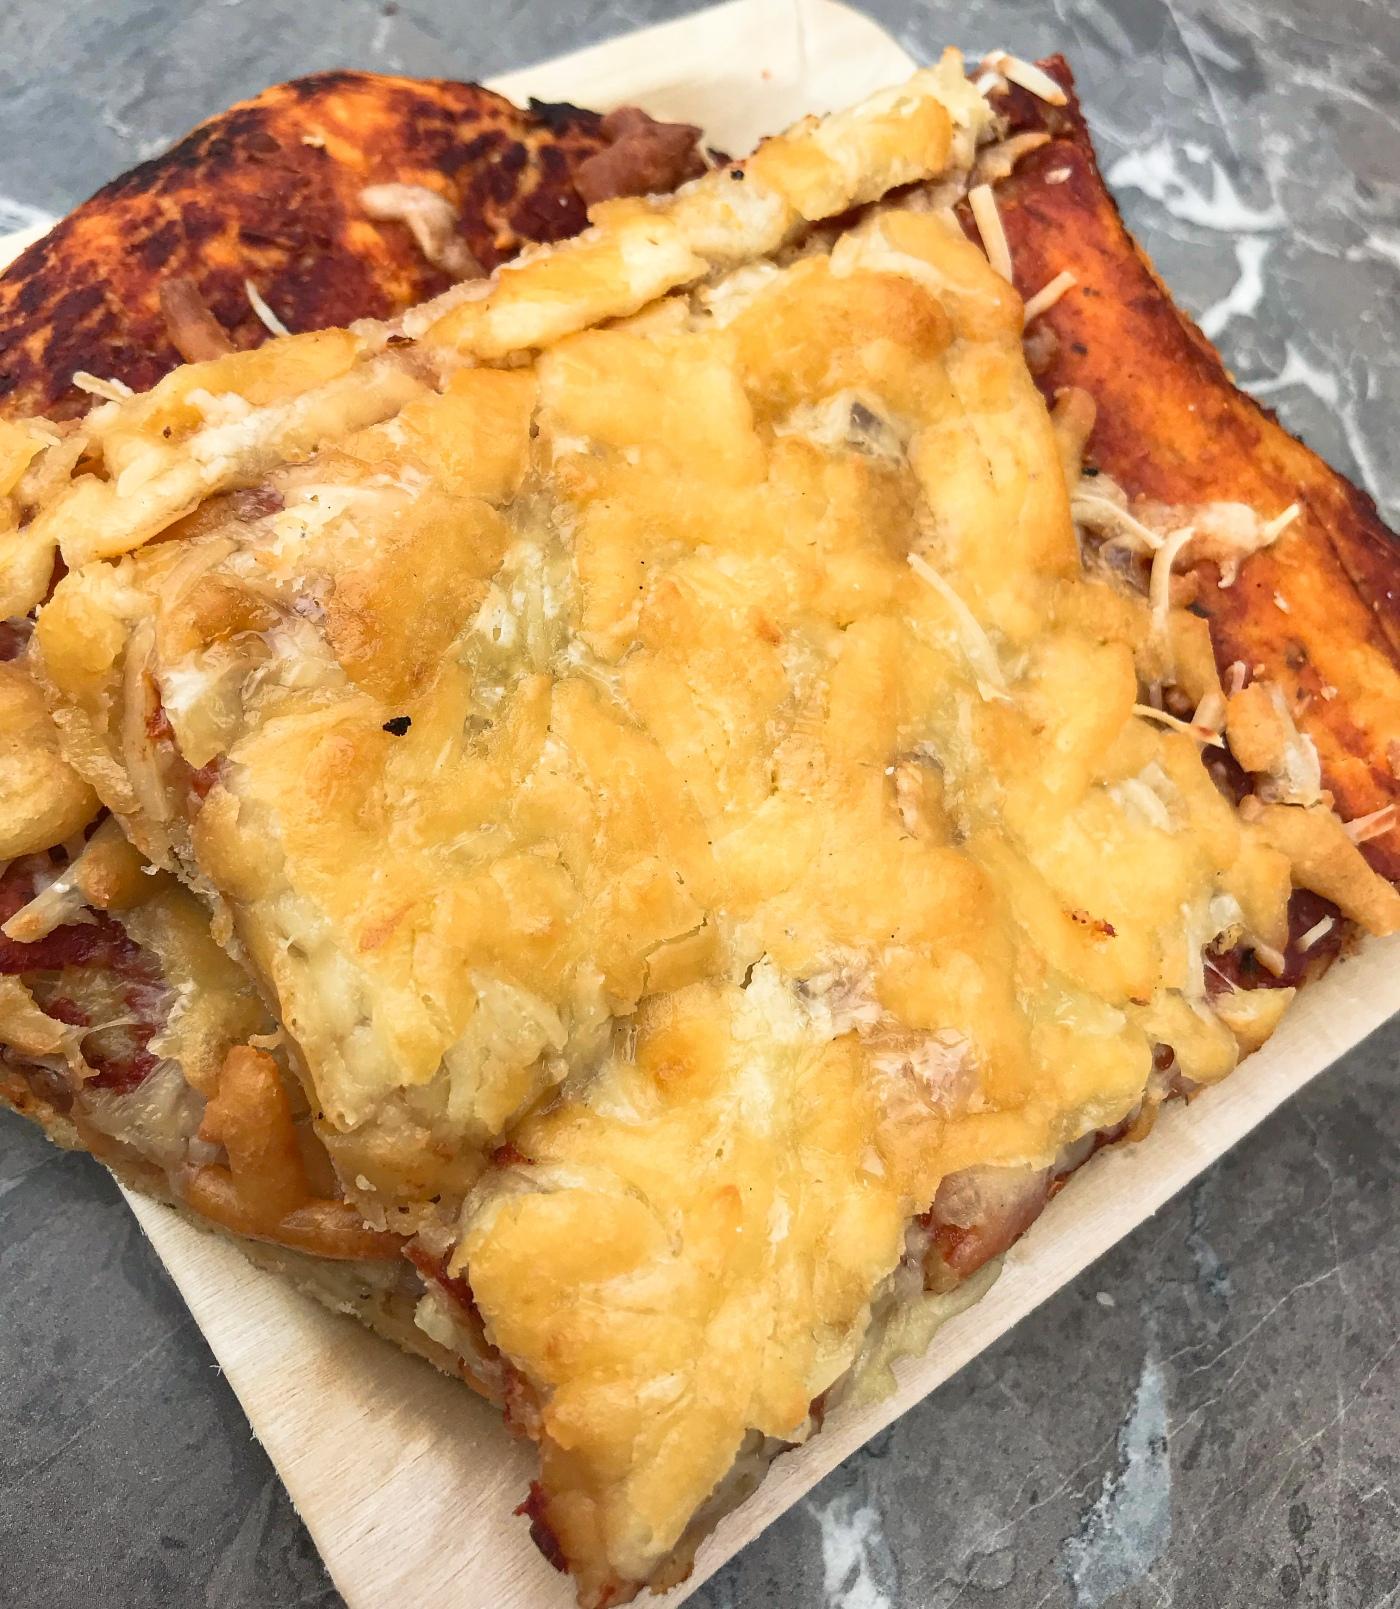 Three cheese pizza